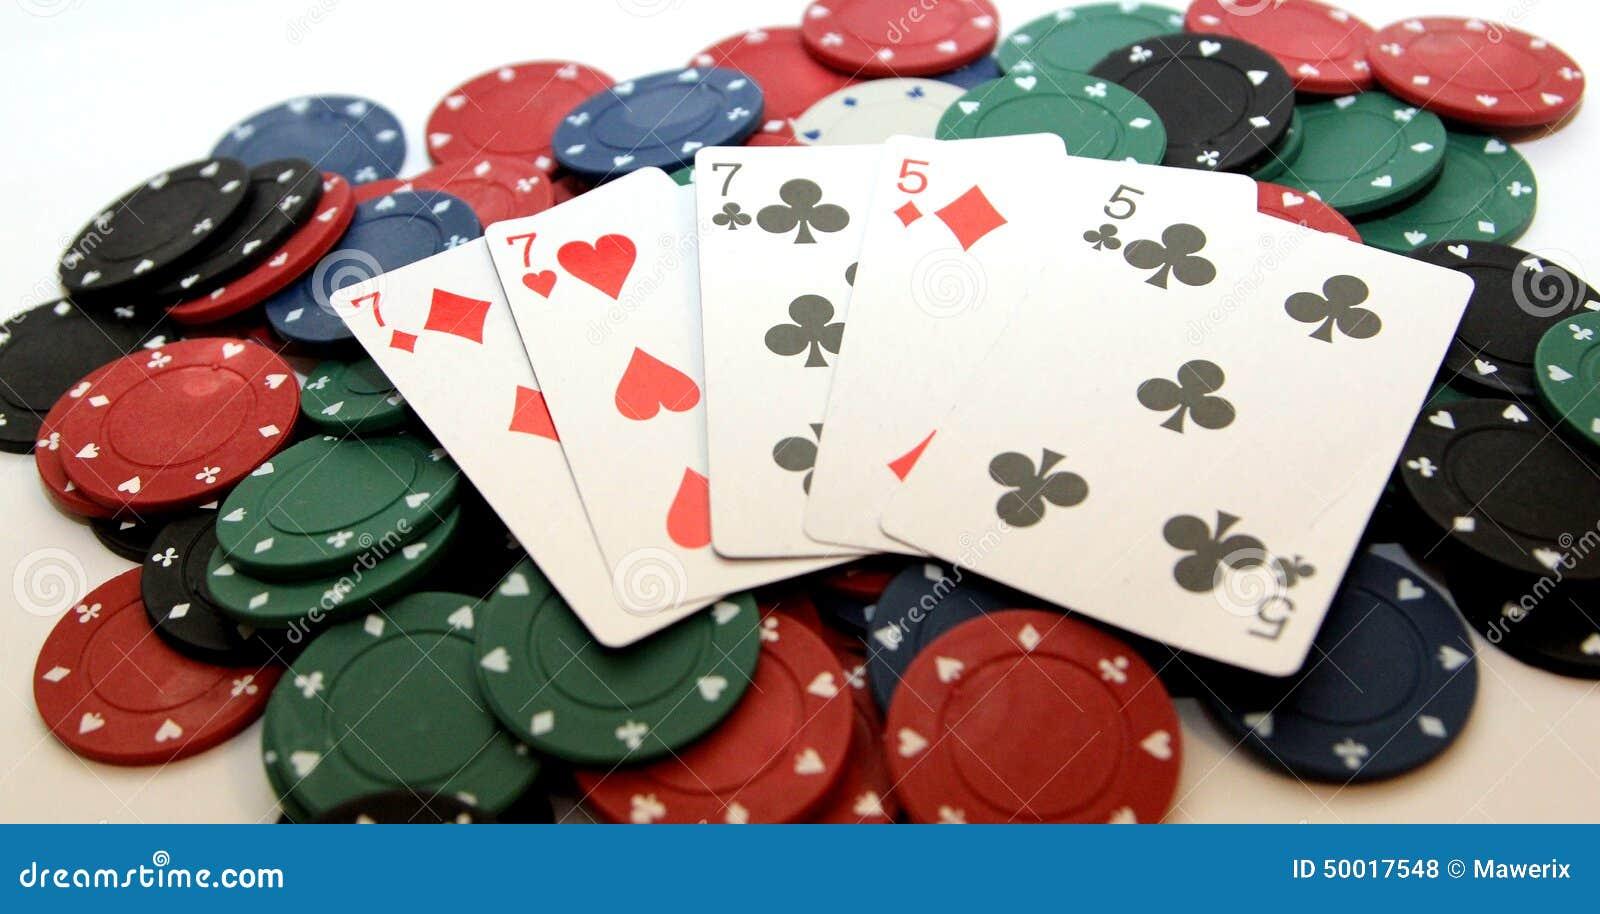 Poker chips and full house